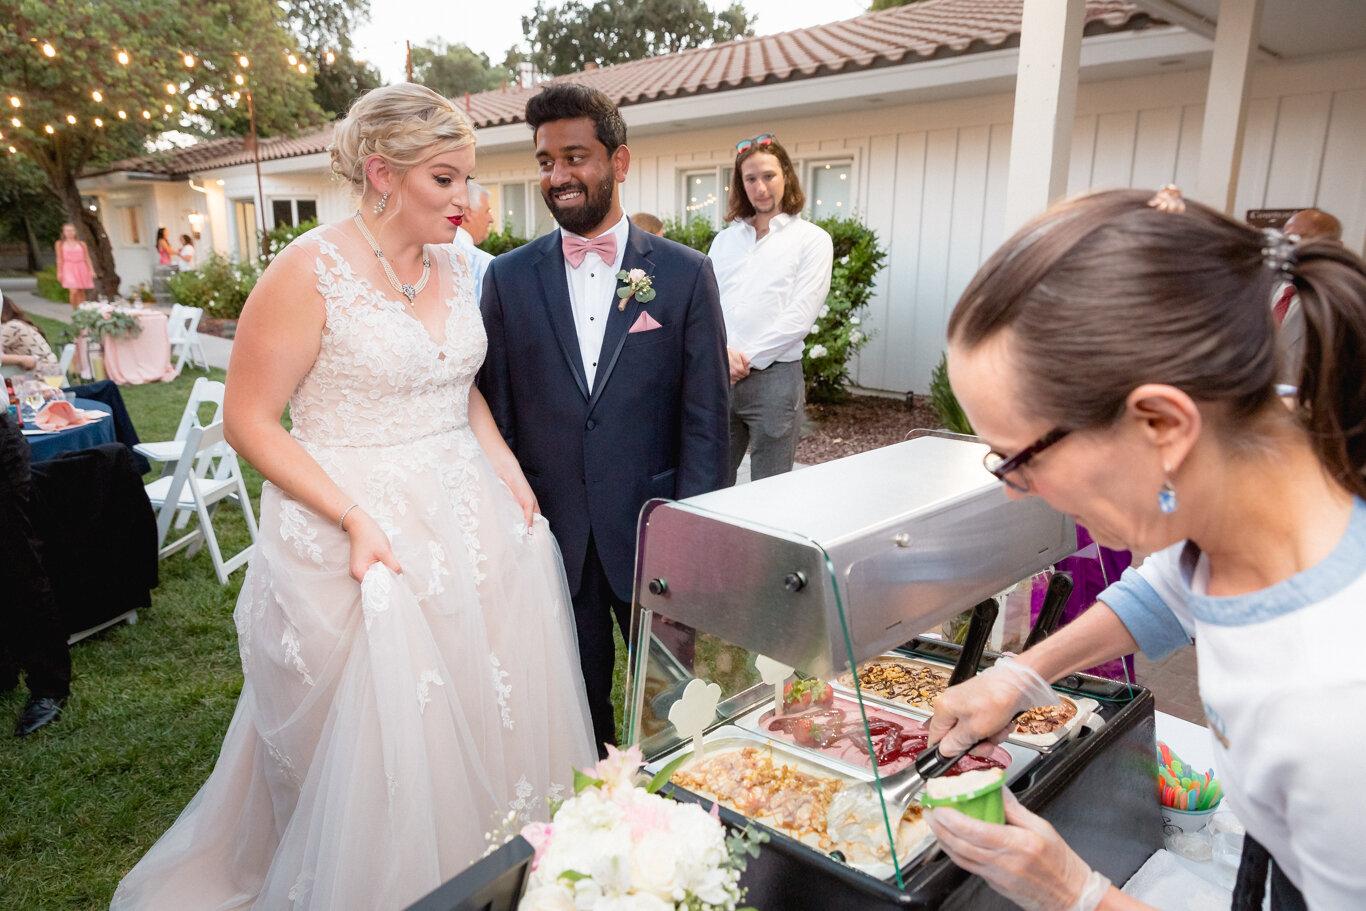 2019.08.24_Emily-Ashir-Wedding-at-the-Maples-6342.jpg